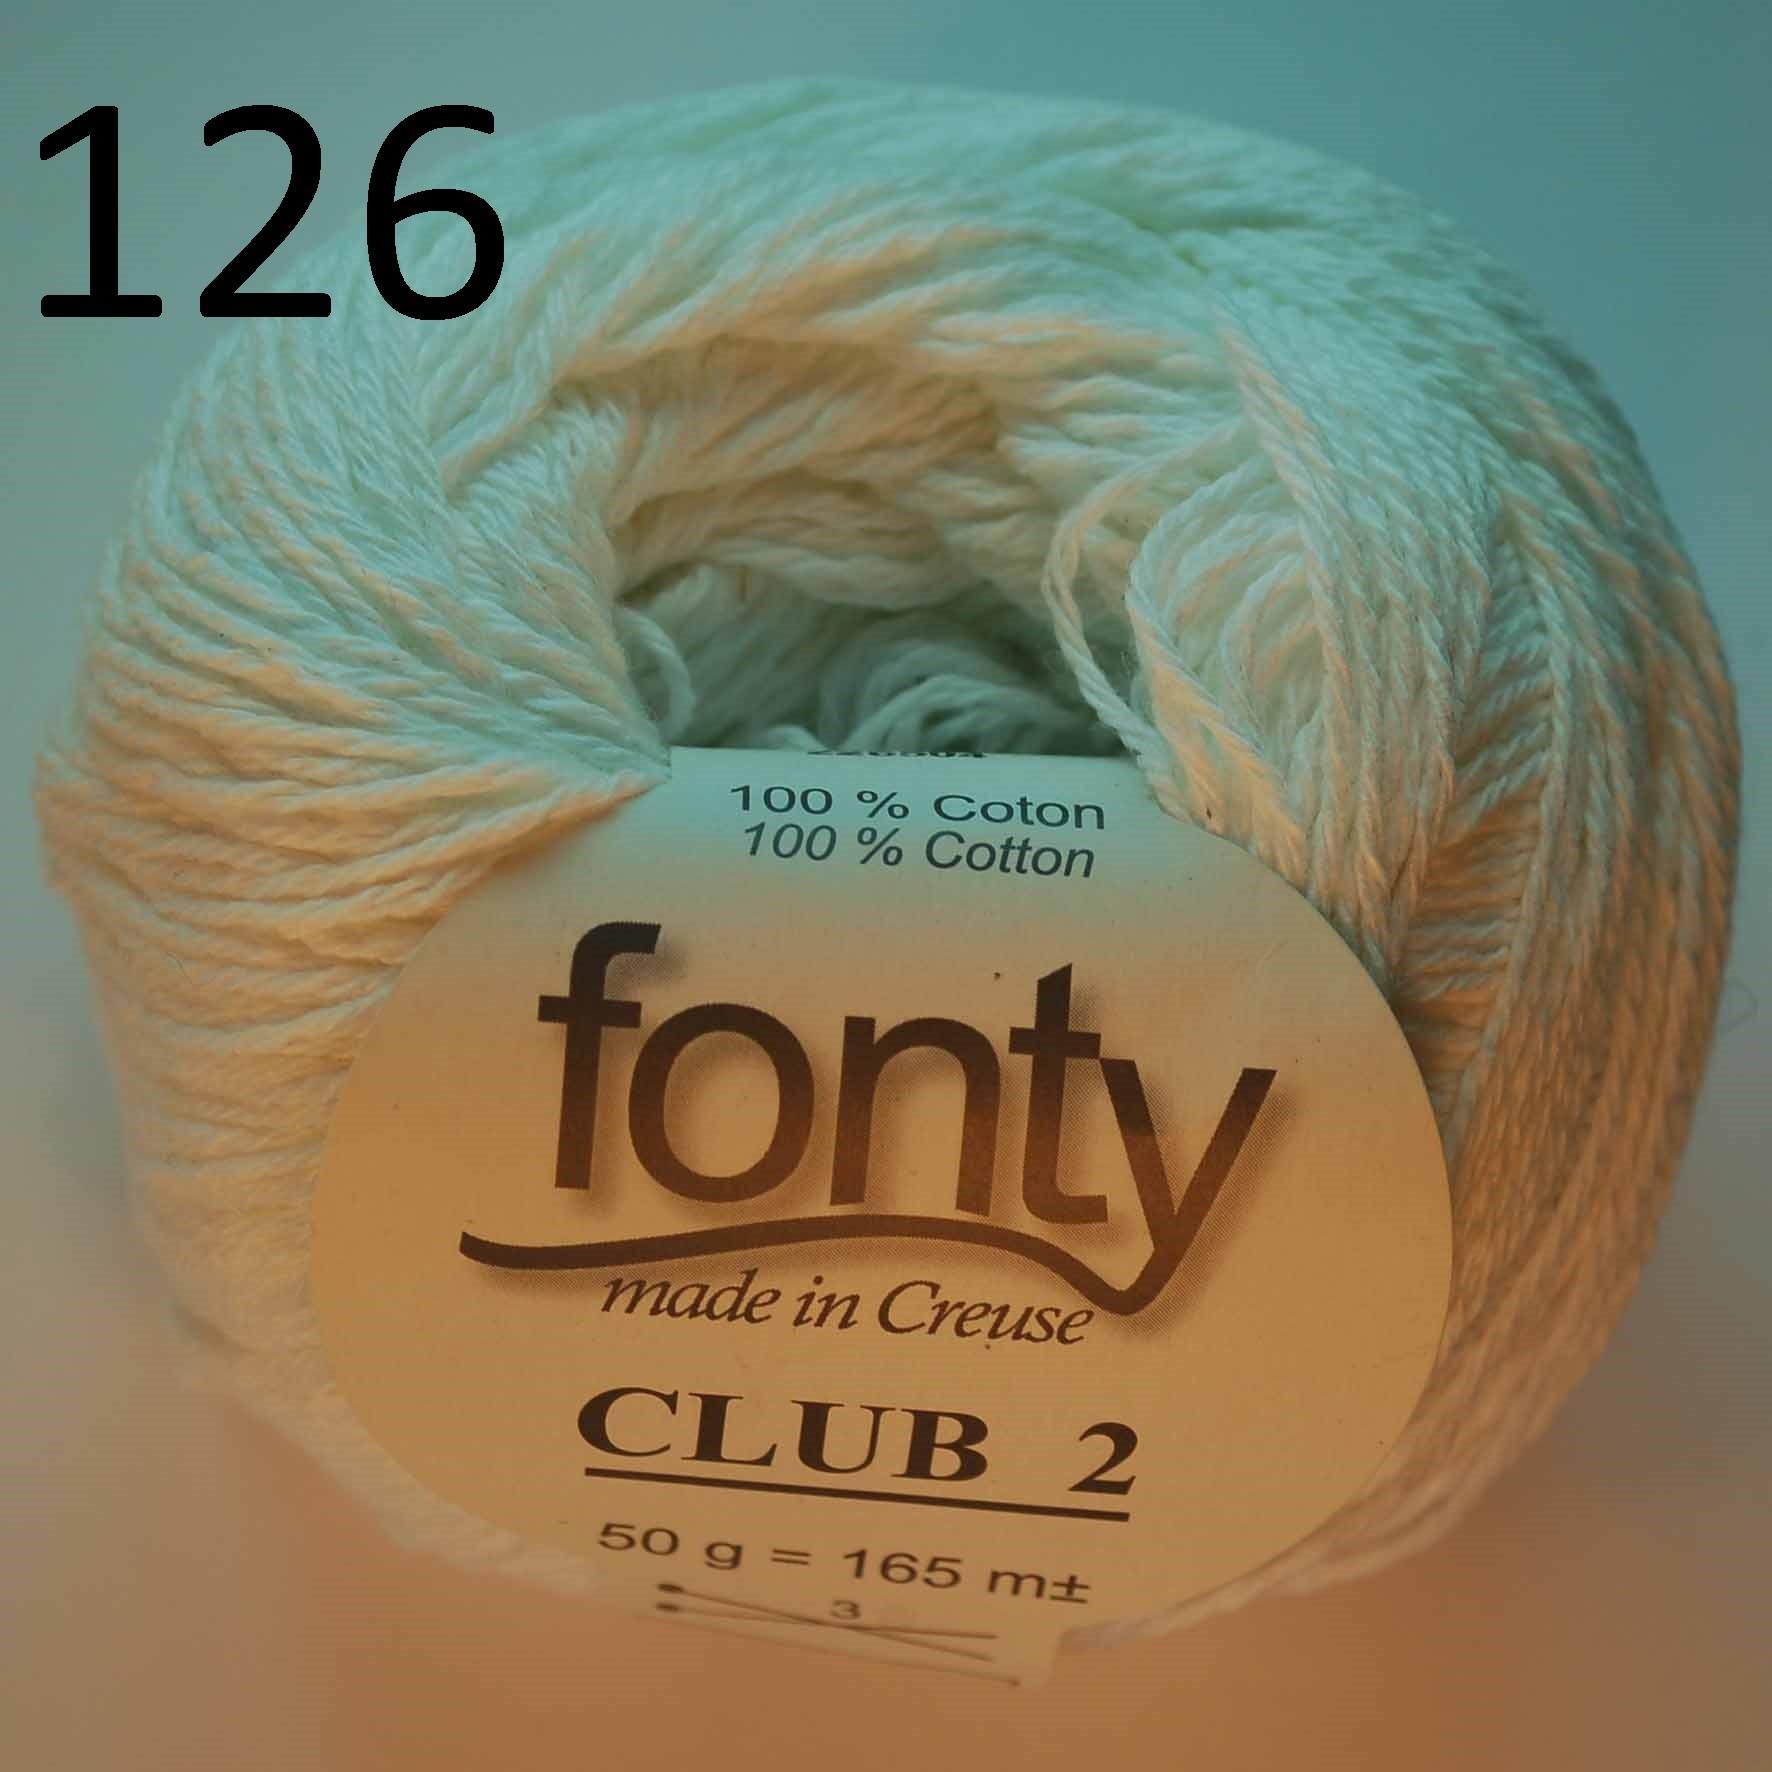 Club 2 126